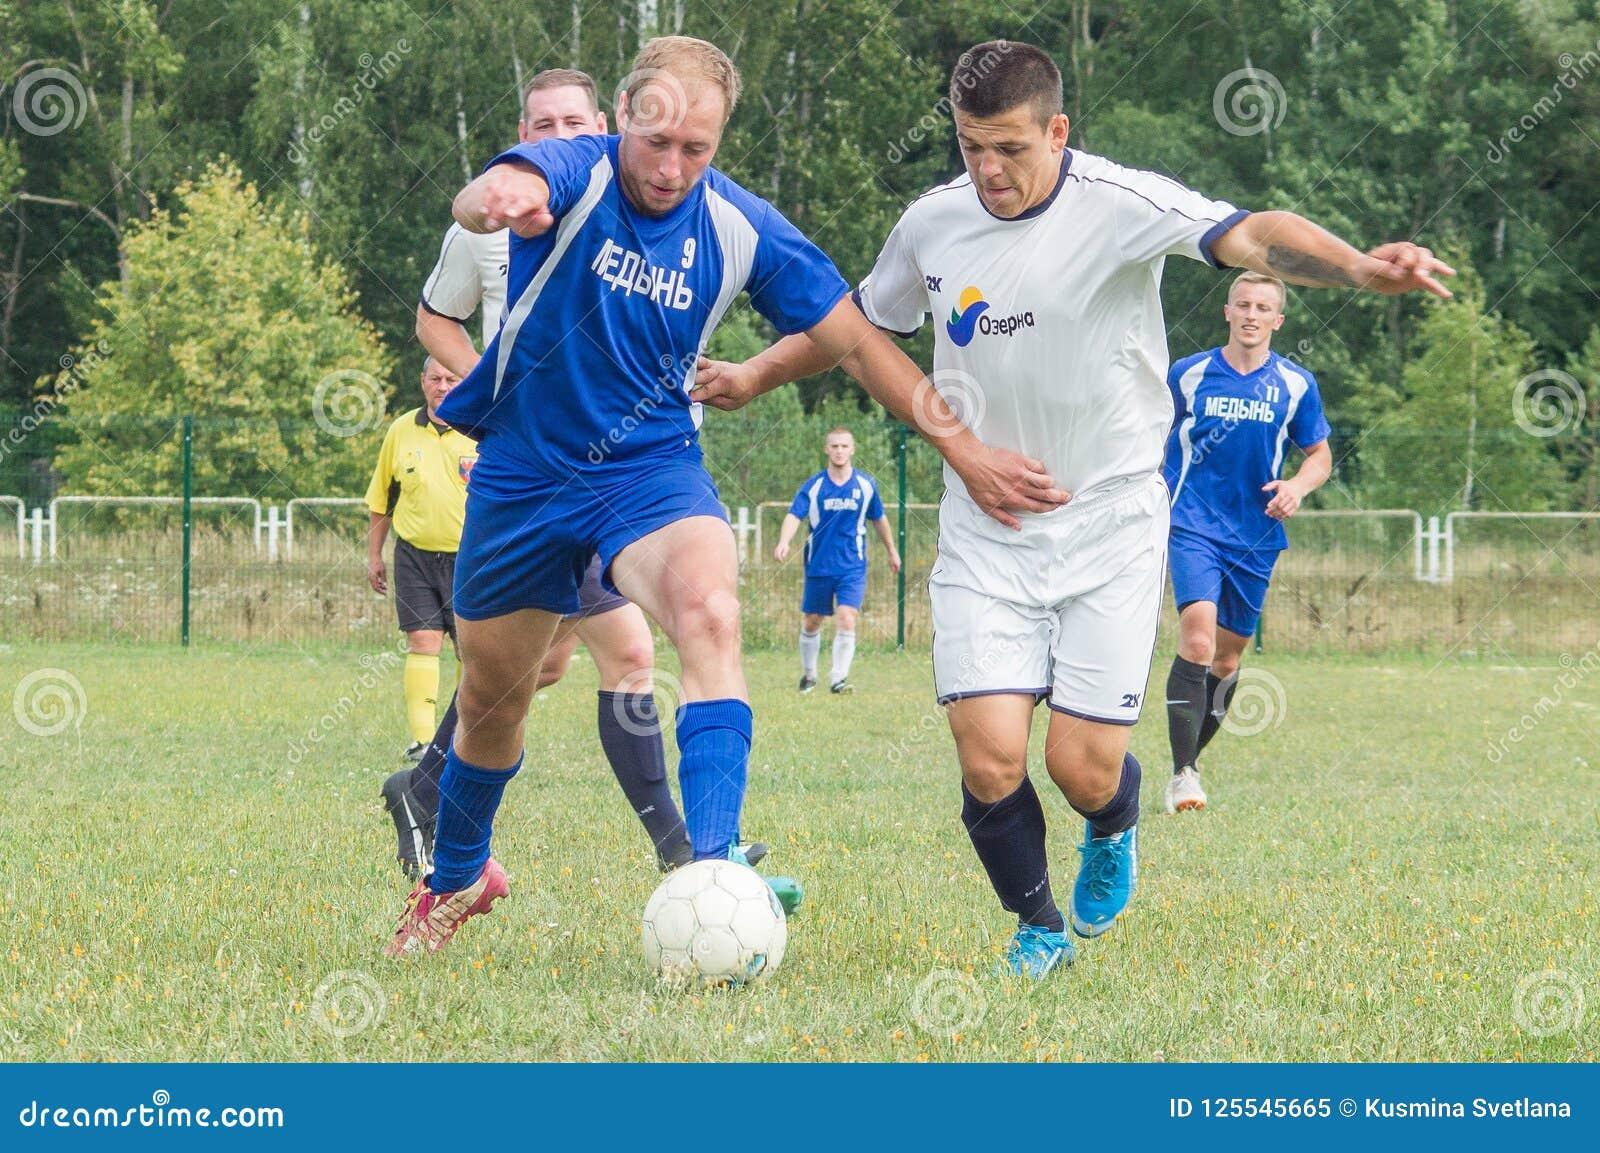 Чемпионат футбола дилетанта в зоне Kaluga России